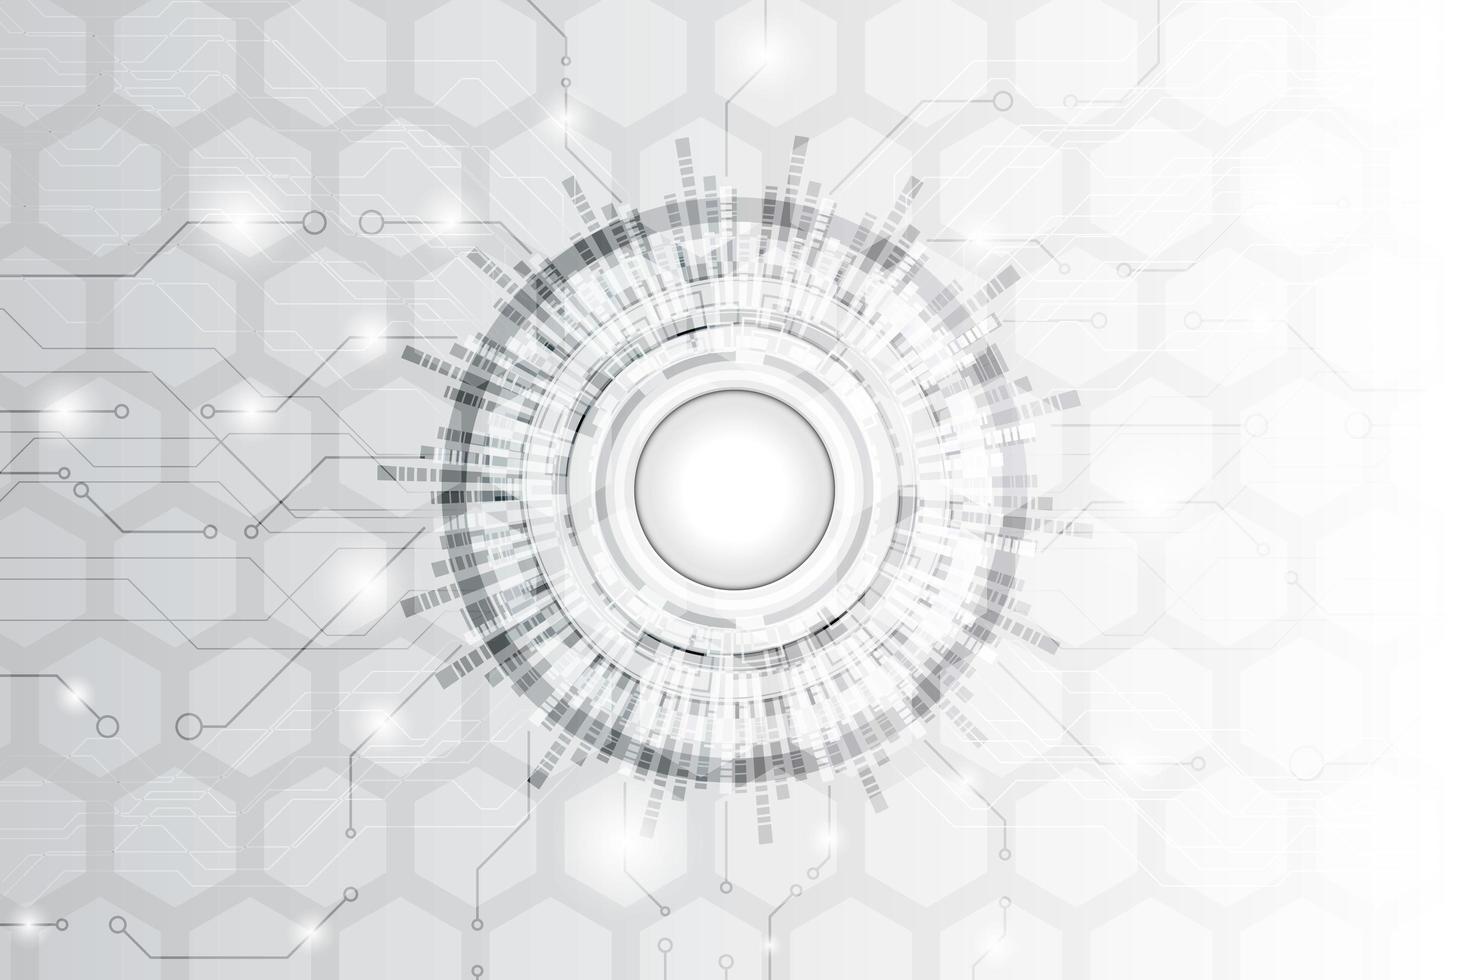 fundo de equipamento abstrato tecnologia preto e branco vetor